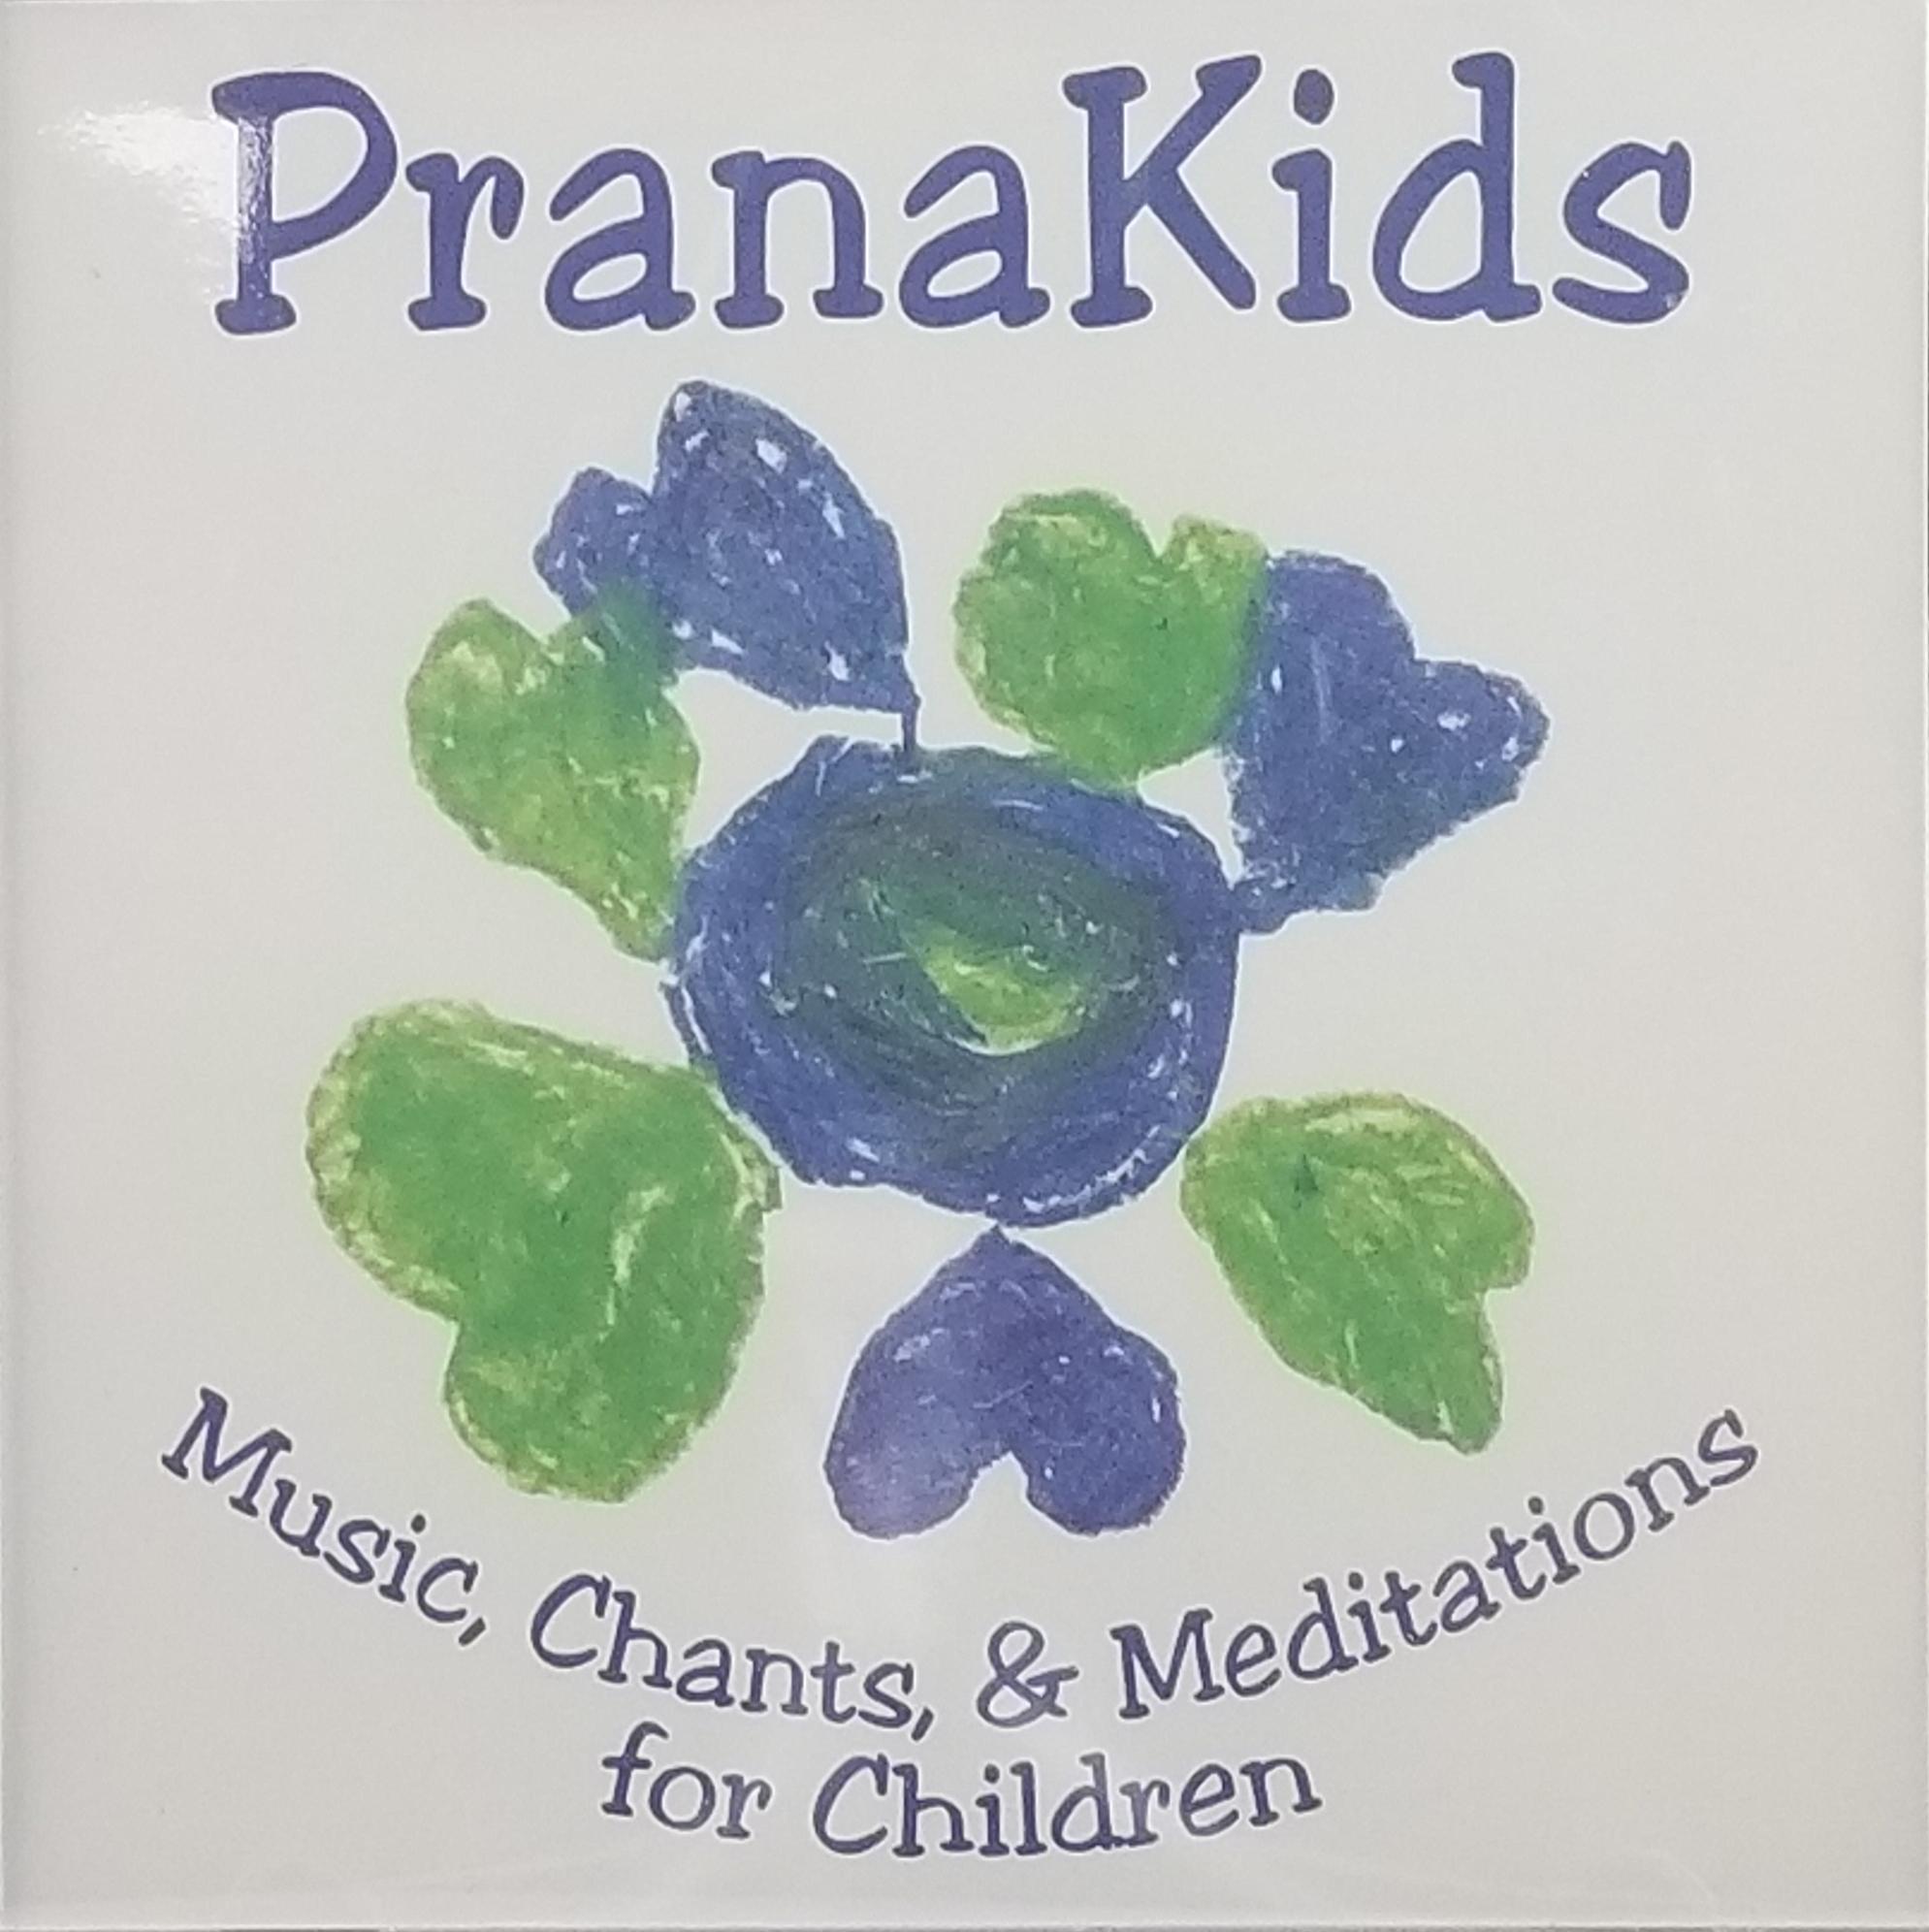 Prana Kids - Music, Chants, & Meditations for Children